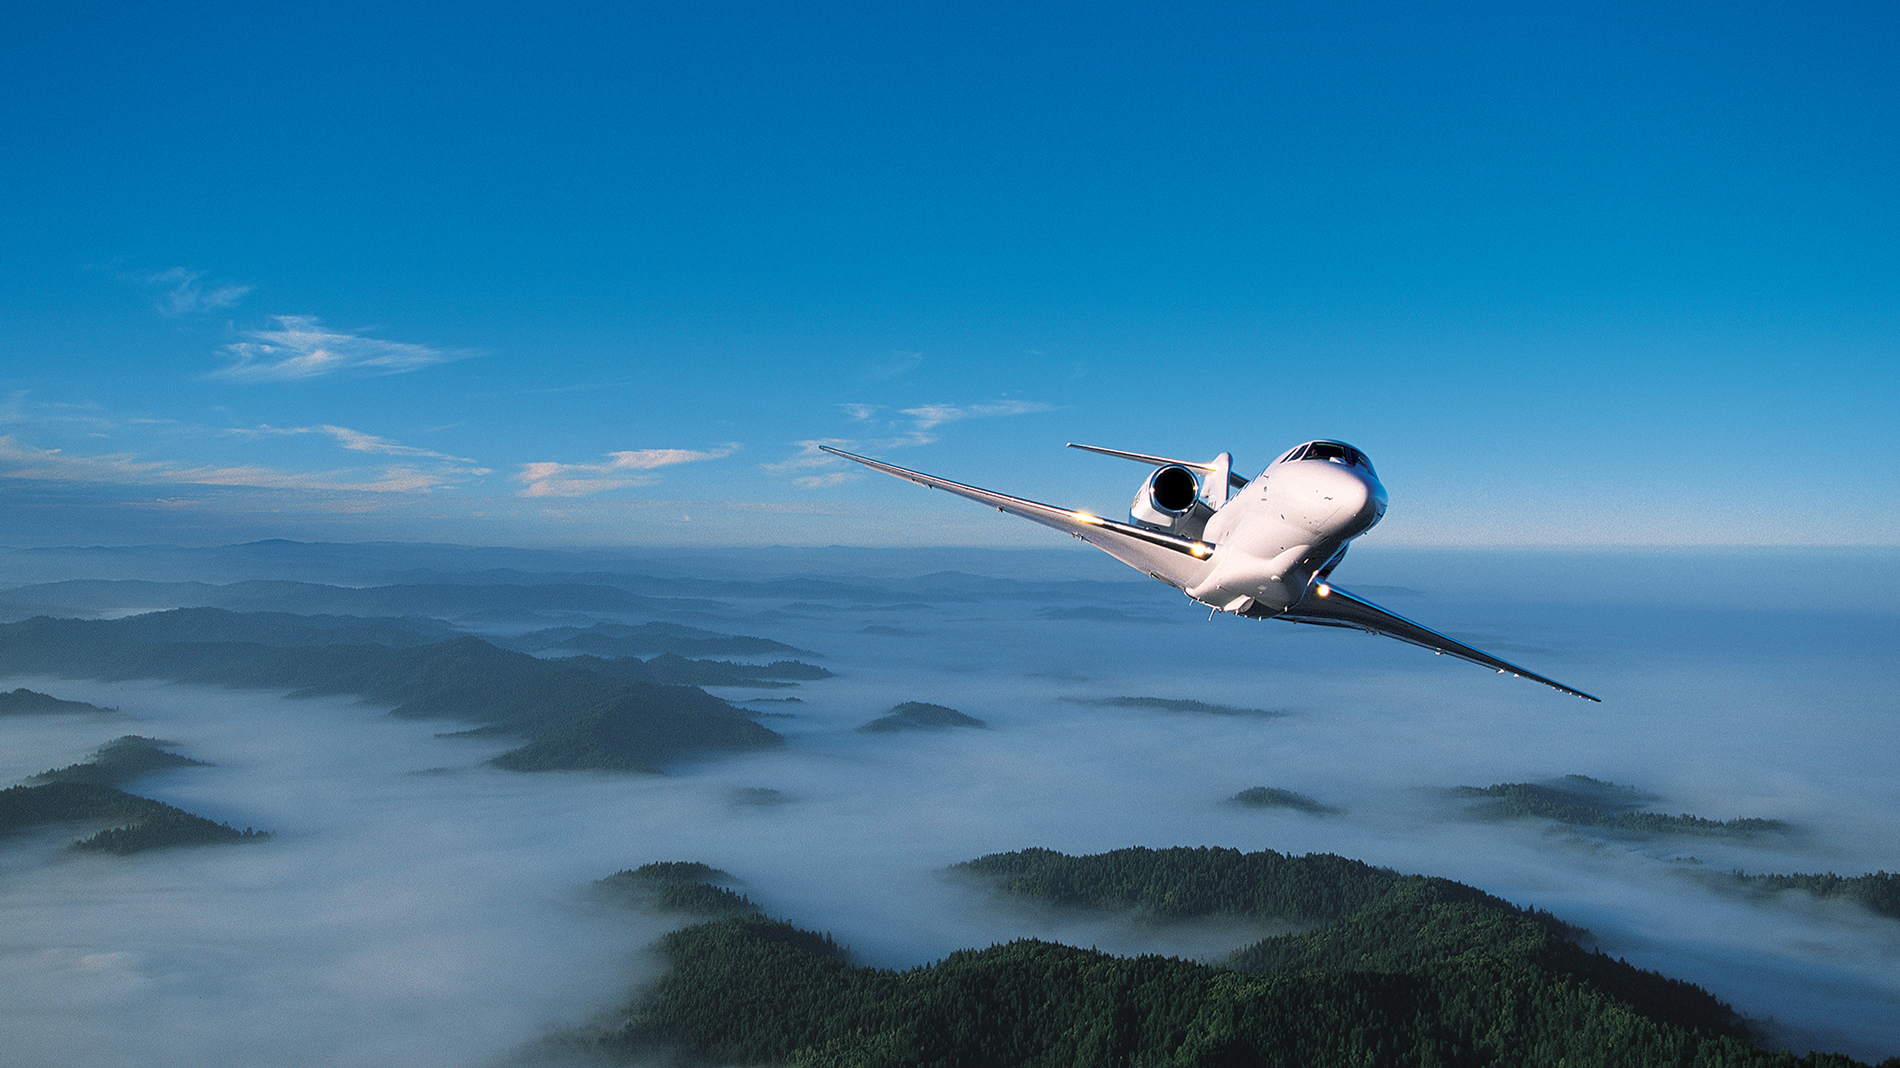 XO_CX-Air-01_300dpi_CMYK_091712newest.jpg